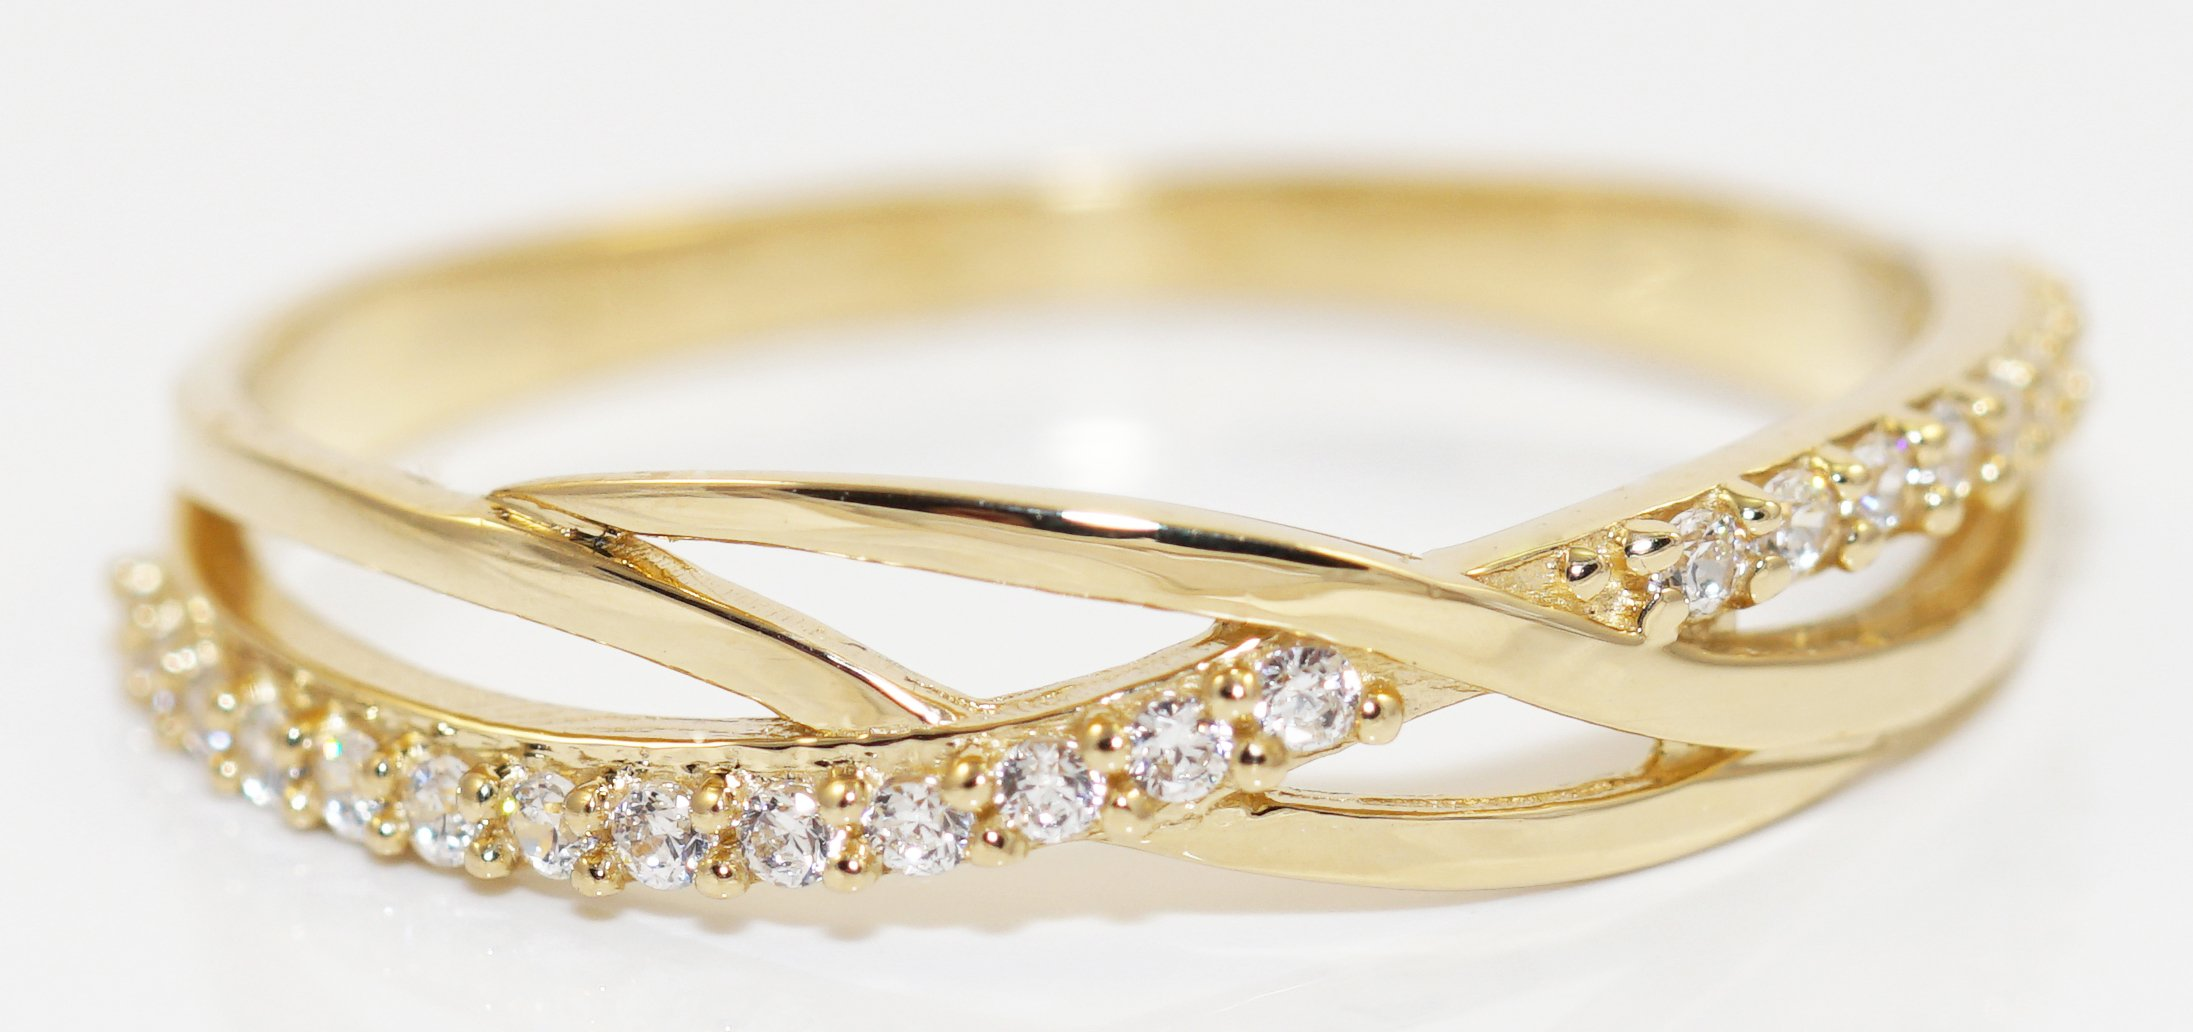 Zlatý prsteň 585 Zirkónmi, MOŽNOSŤ